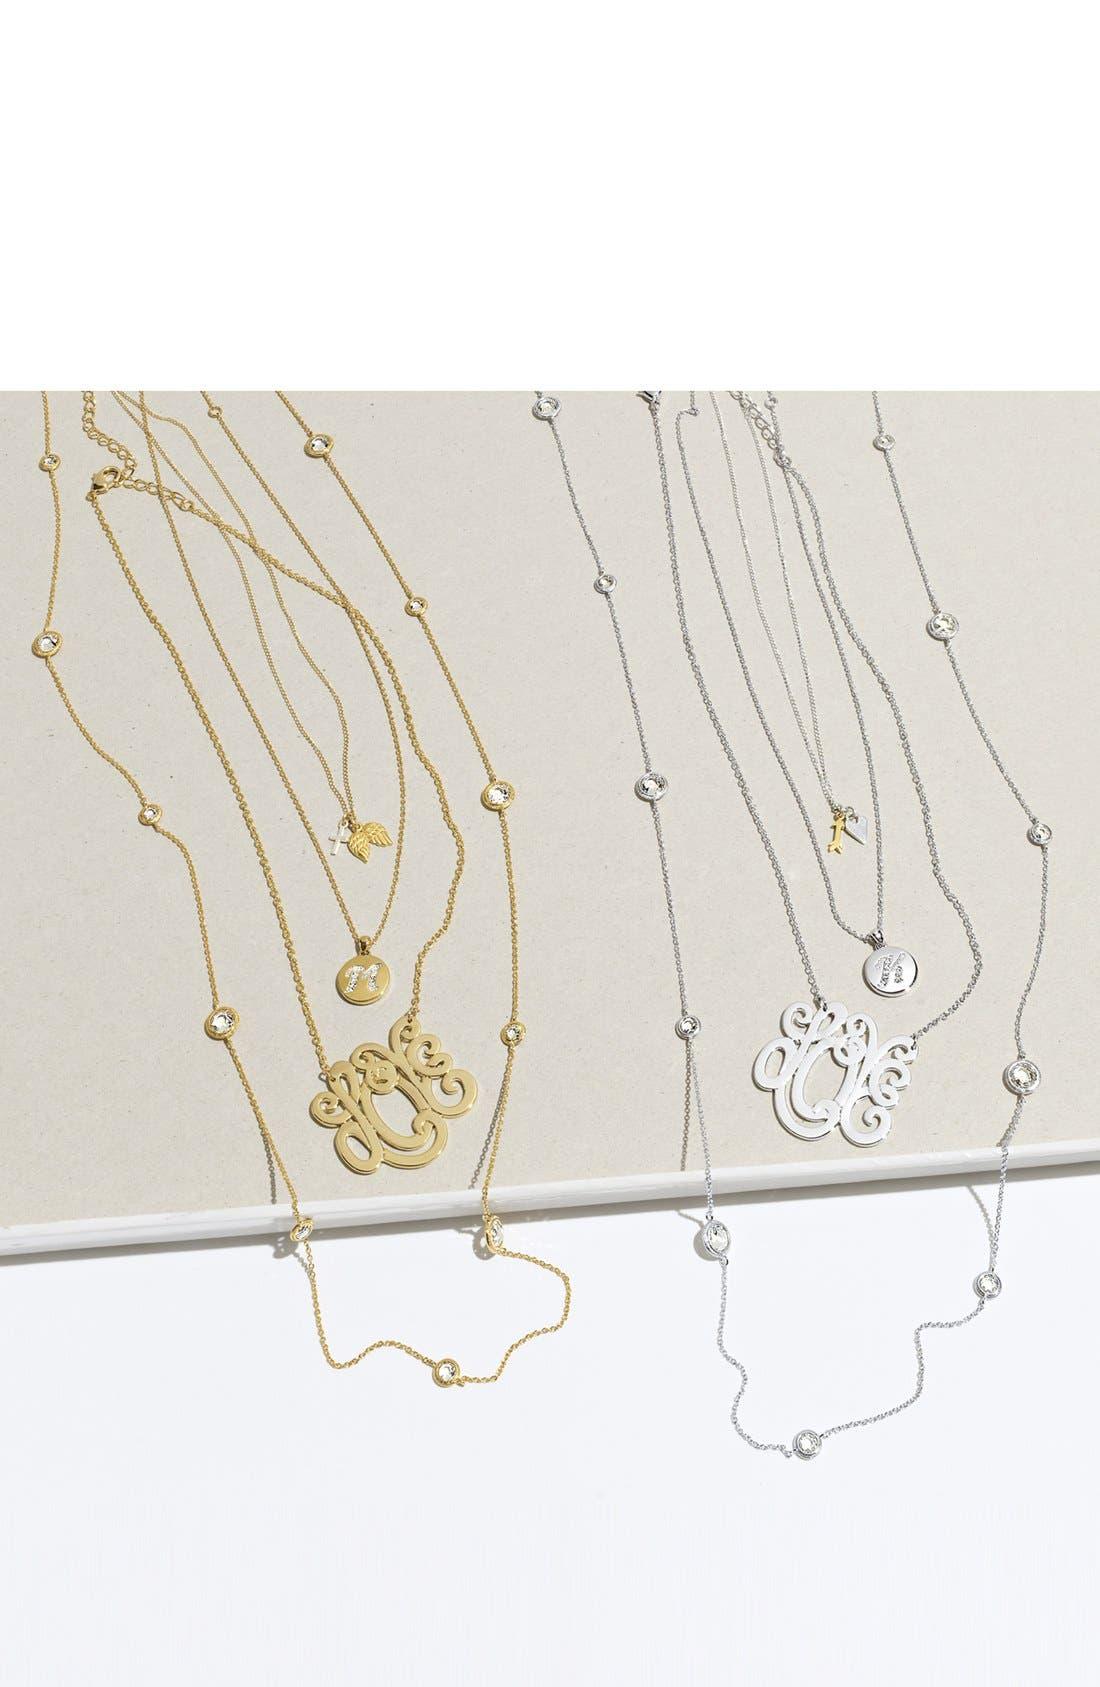 NADRI,                             Boxed Initial Pendant Necklace,                             Alternate thumbnail 4, color,                             040